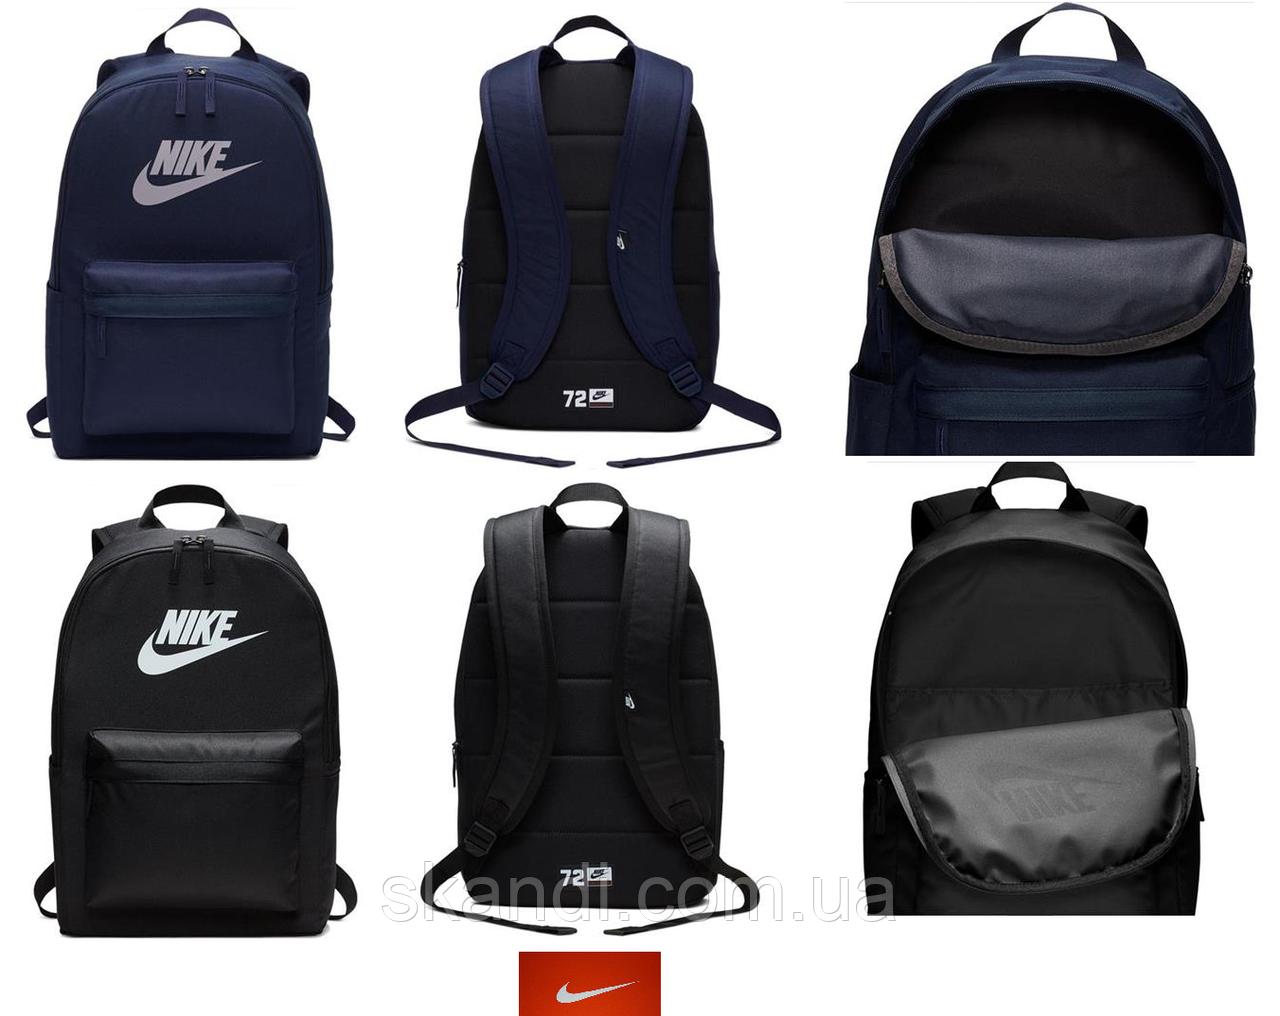 Рюкзак Nike Hernitage (Оригинал) 2 цветв